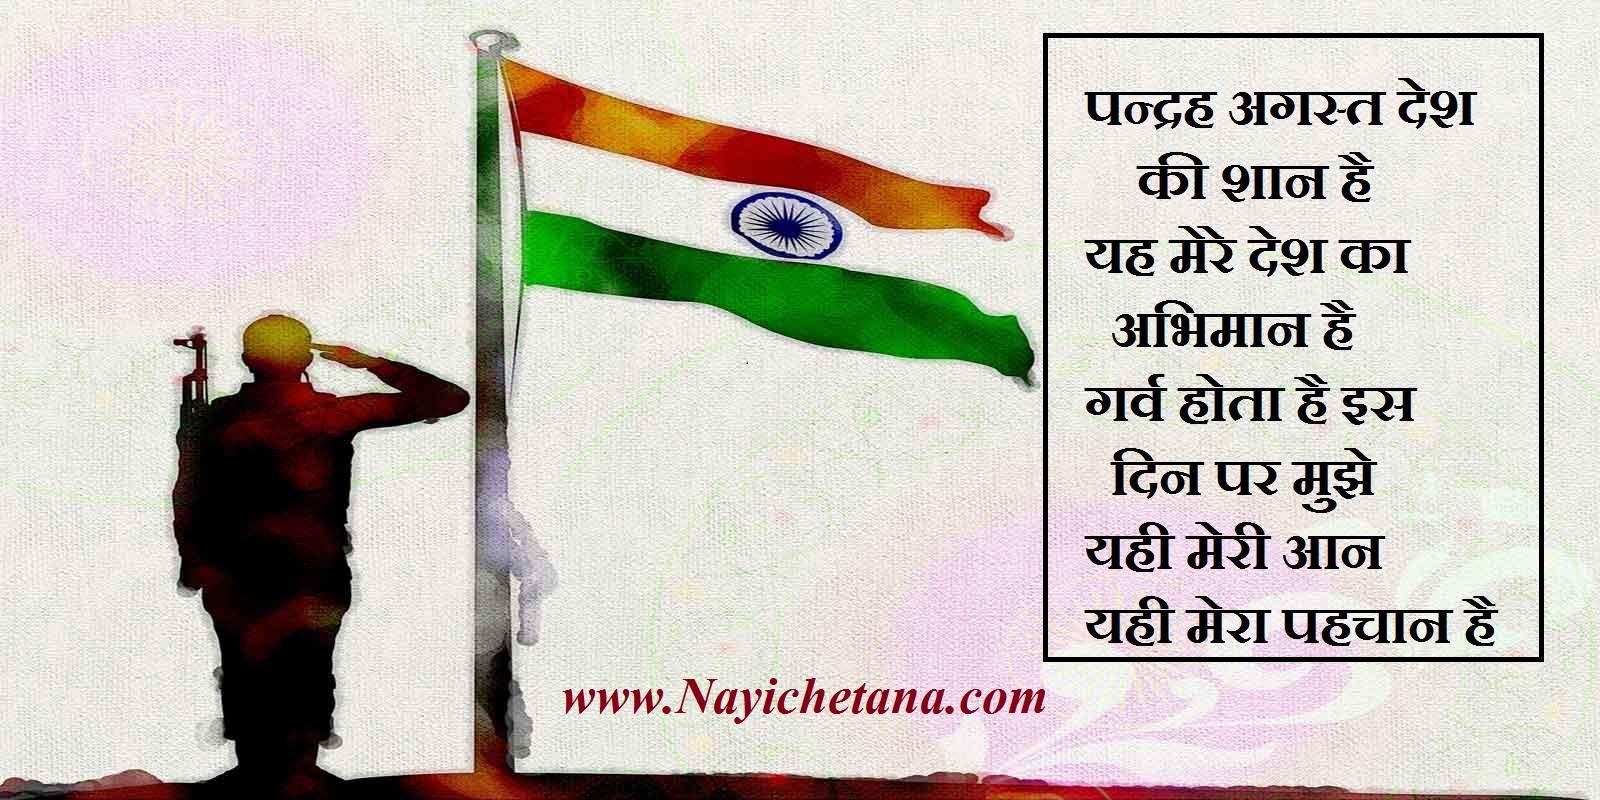 15 अगस्त पर देशभक्ति हिंदी कविता ,15 August Independence Day Kavita Hindi Me, 15 august, svtantrta divas, aajadi divas